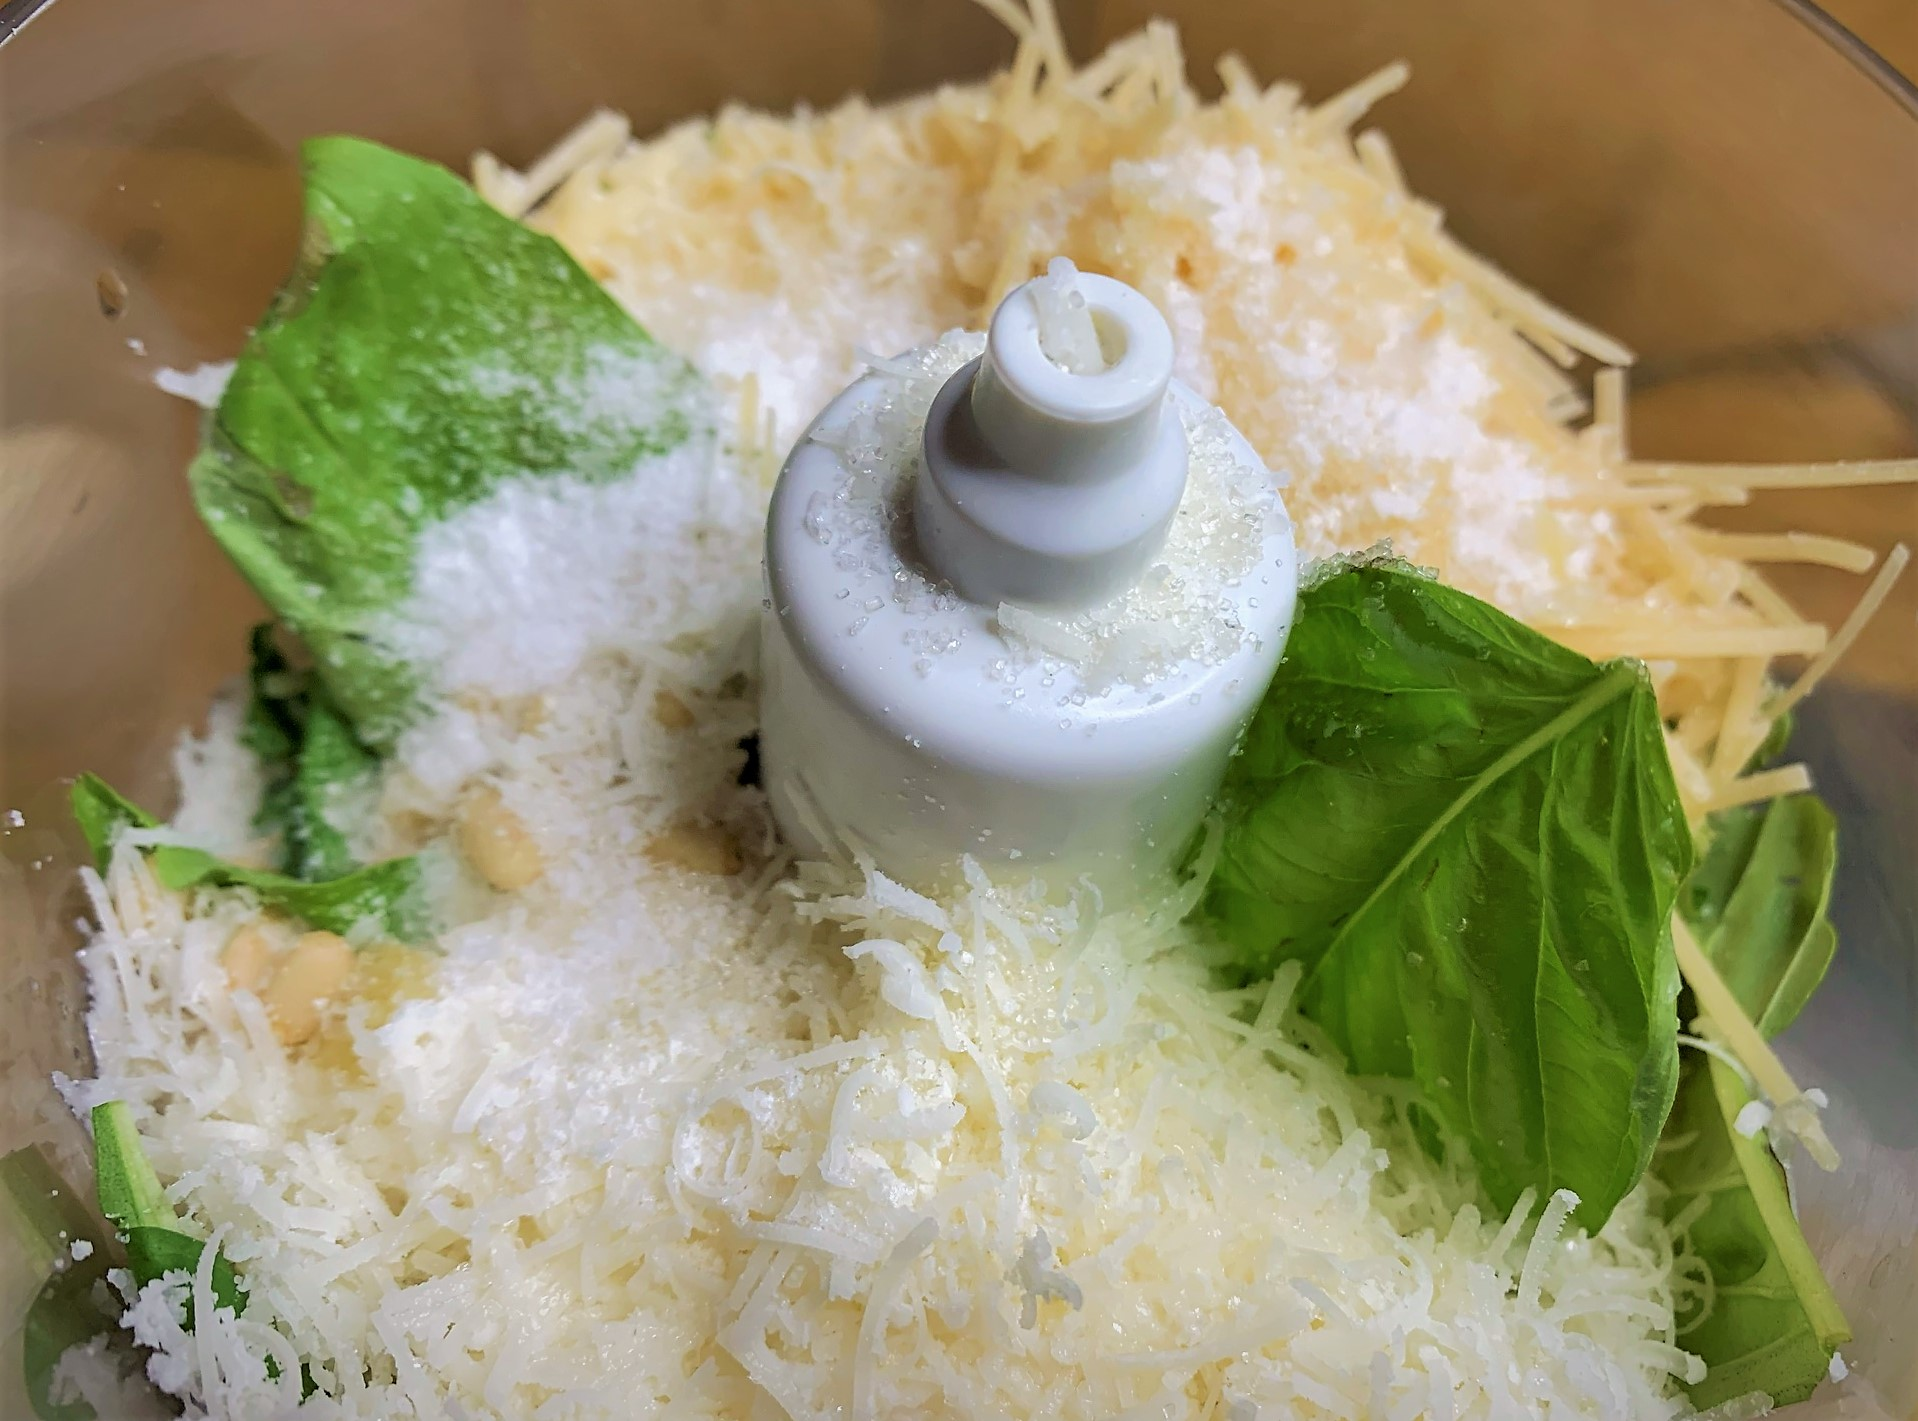 The Pesto Ingredients added to a Food Processor - Trenette al Pesto Recipe from Disney/Pixar's Luca